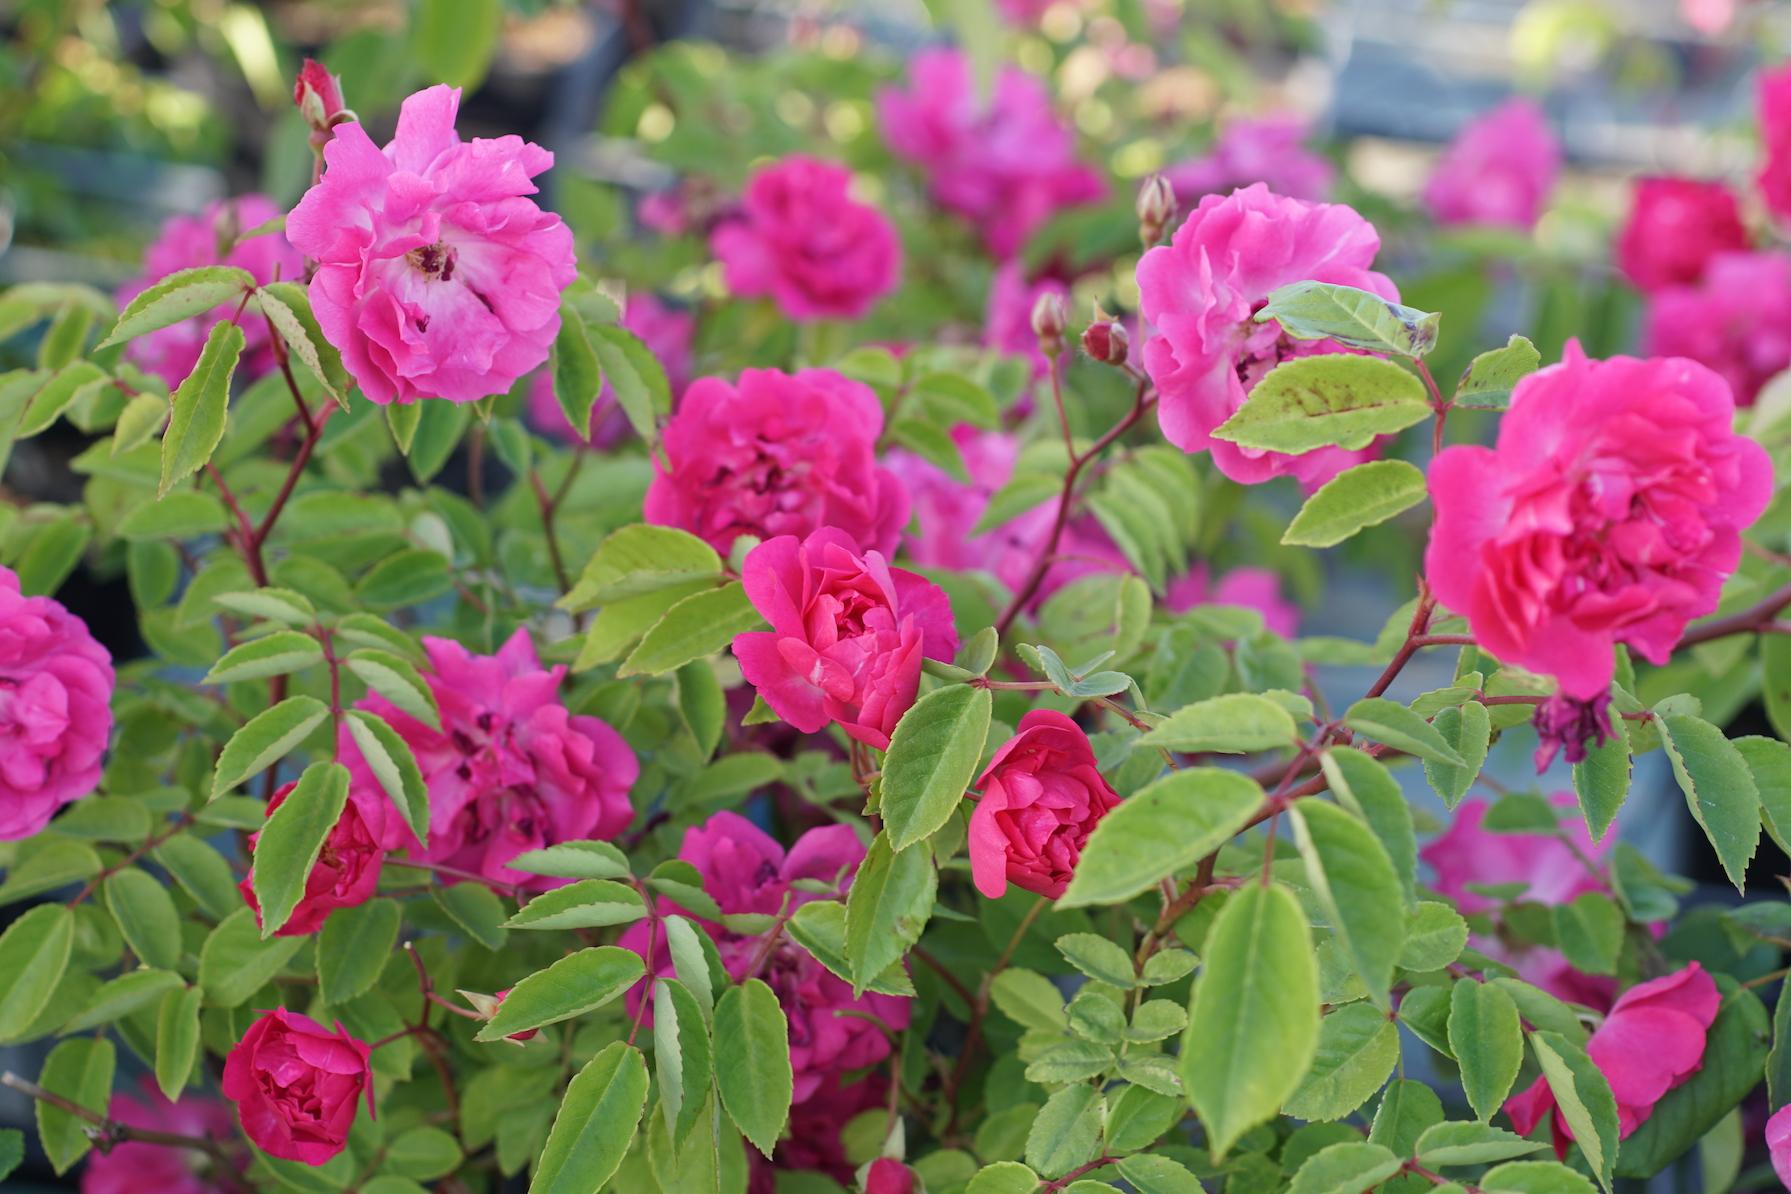 Rosier miniature polyantha - Demitasse® - Roses Guillot®